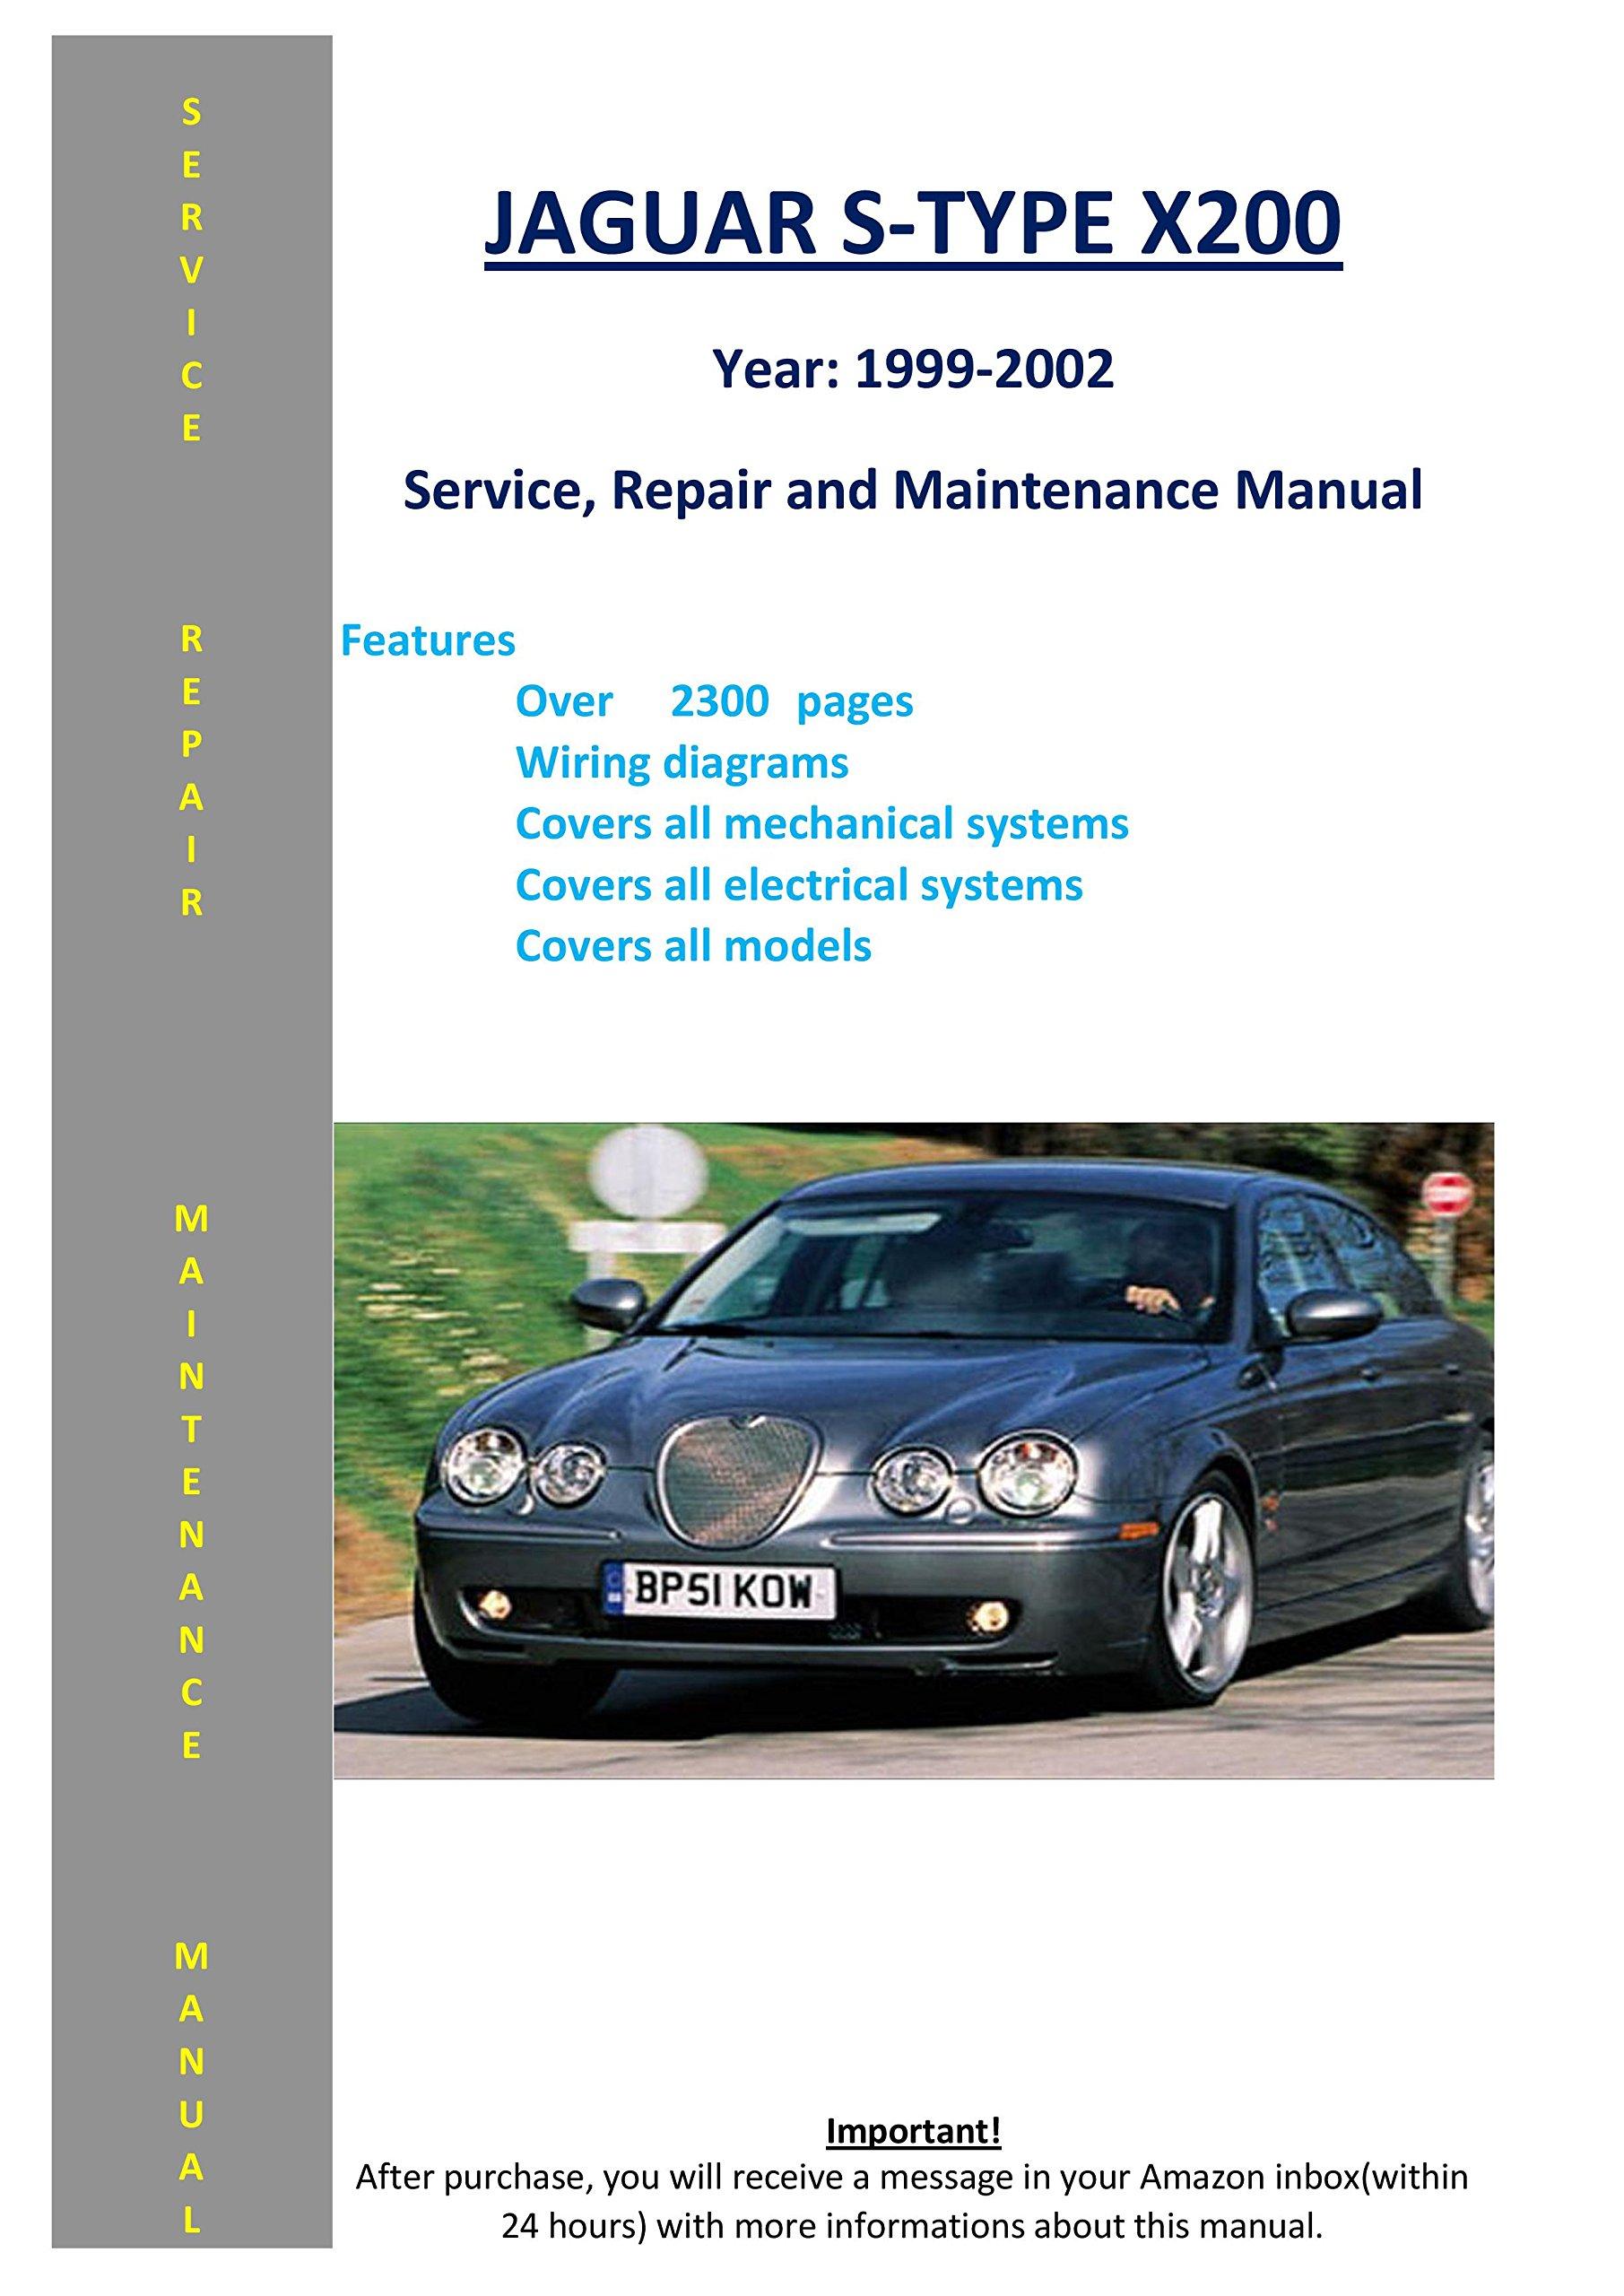 Jaguar S-type X200 From 1999-2002 Service Repair Maintenance Manual:  SoftAuto Manuals: 5217845410047: Amazon.com: Books